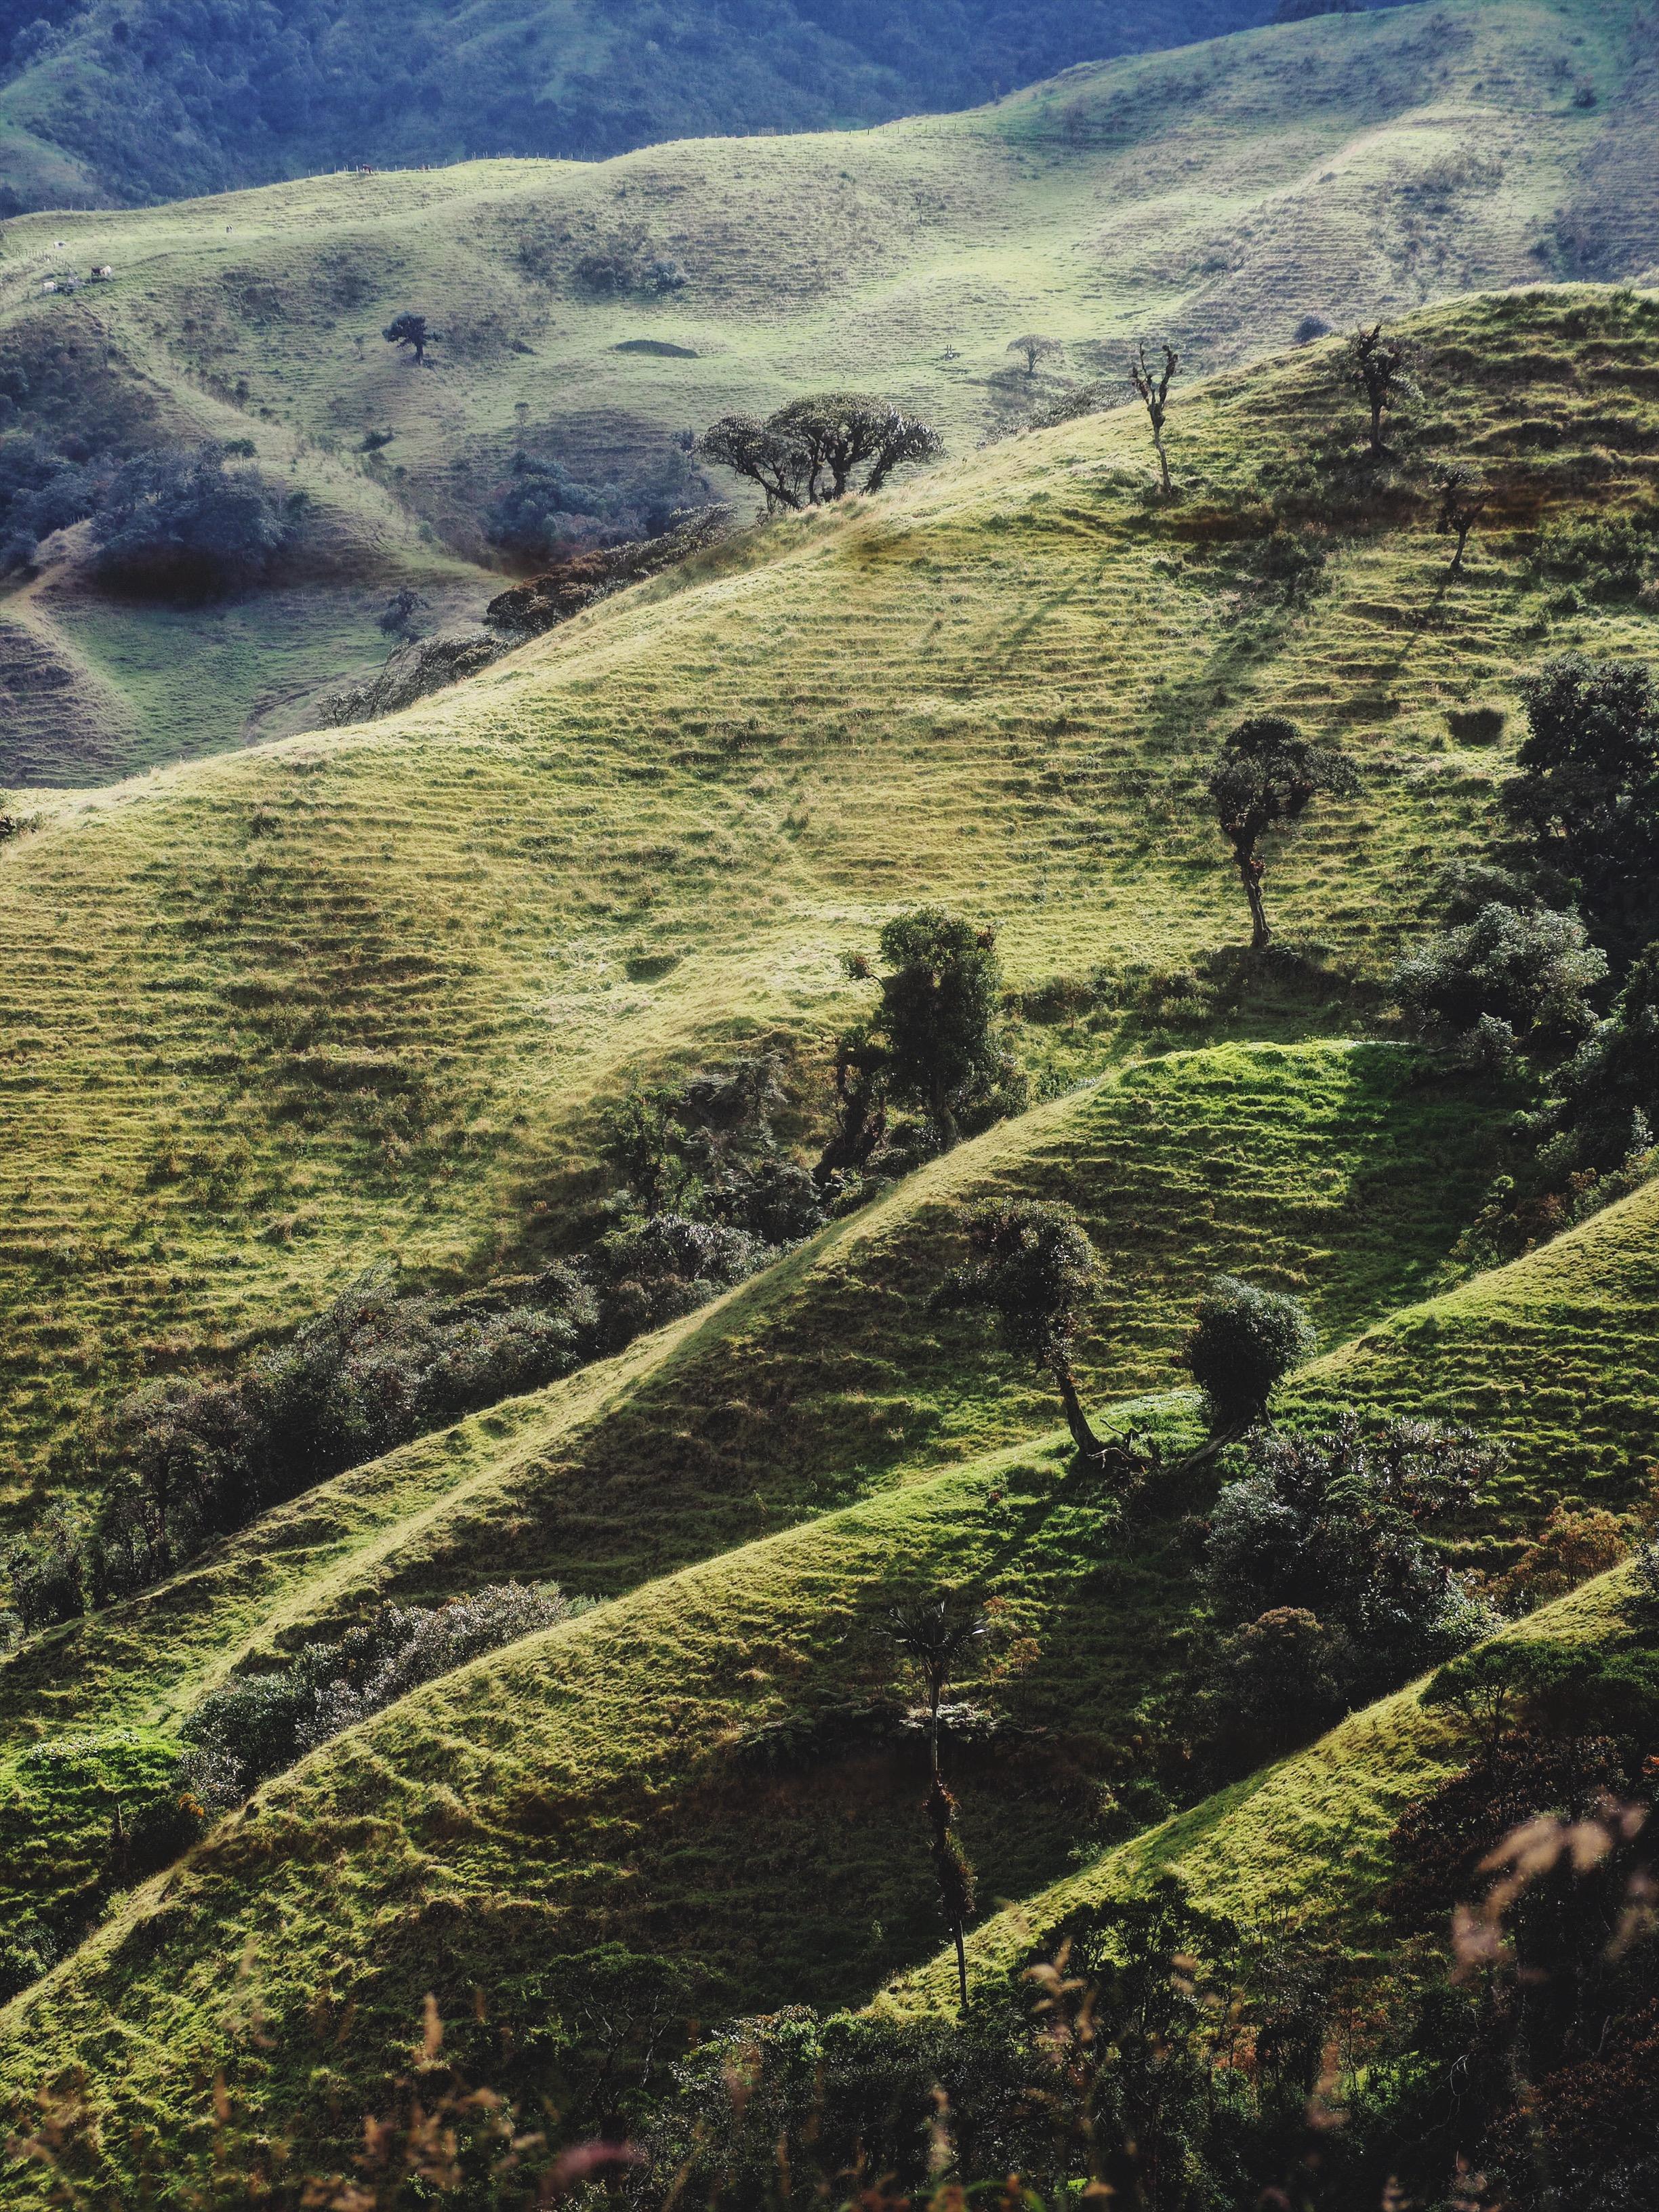 Deforested hillside for ranching